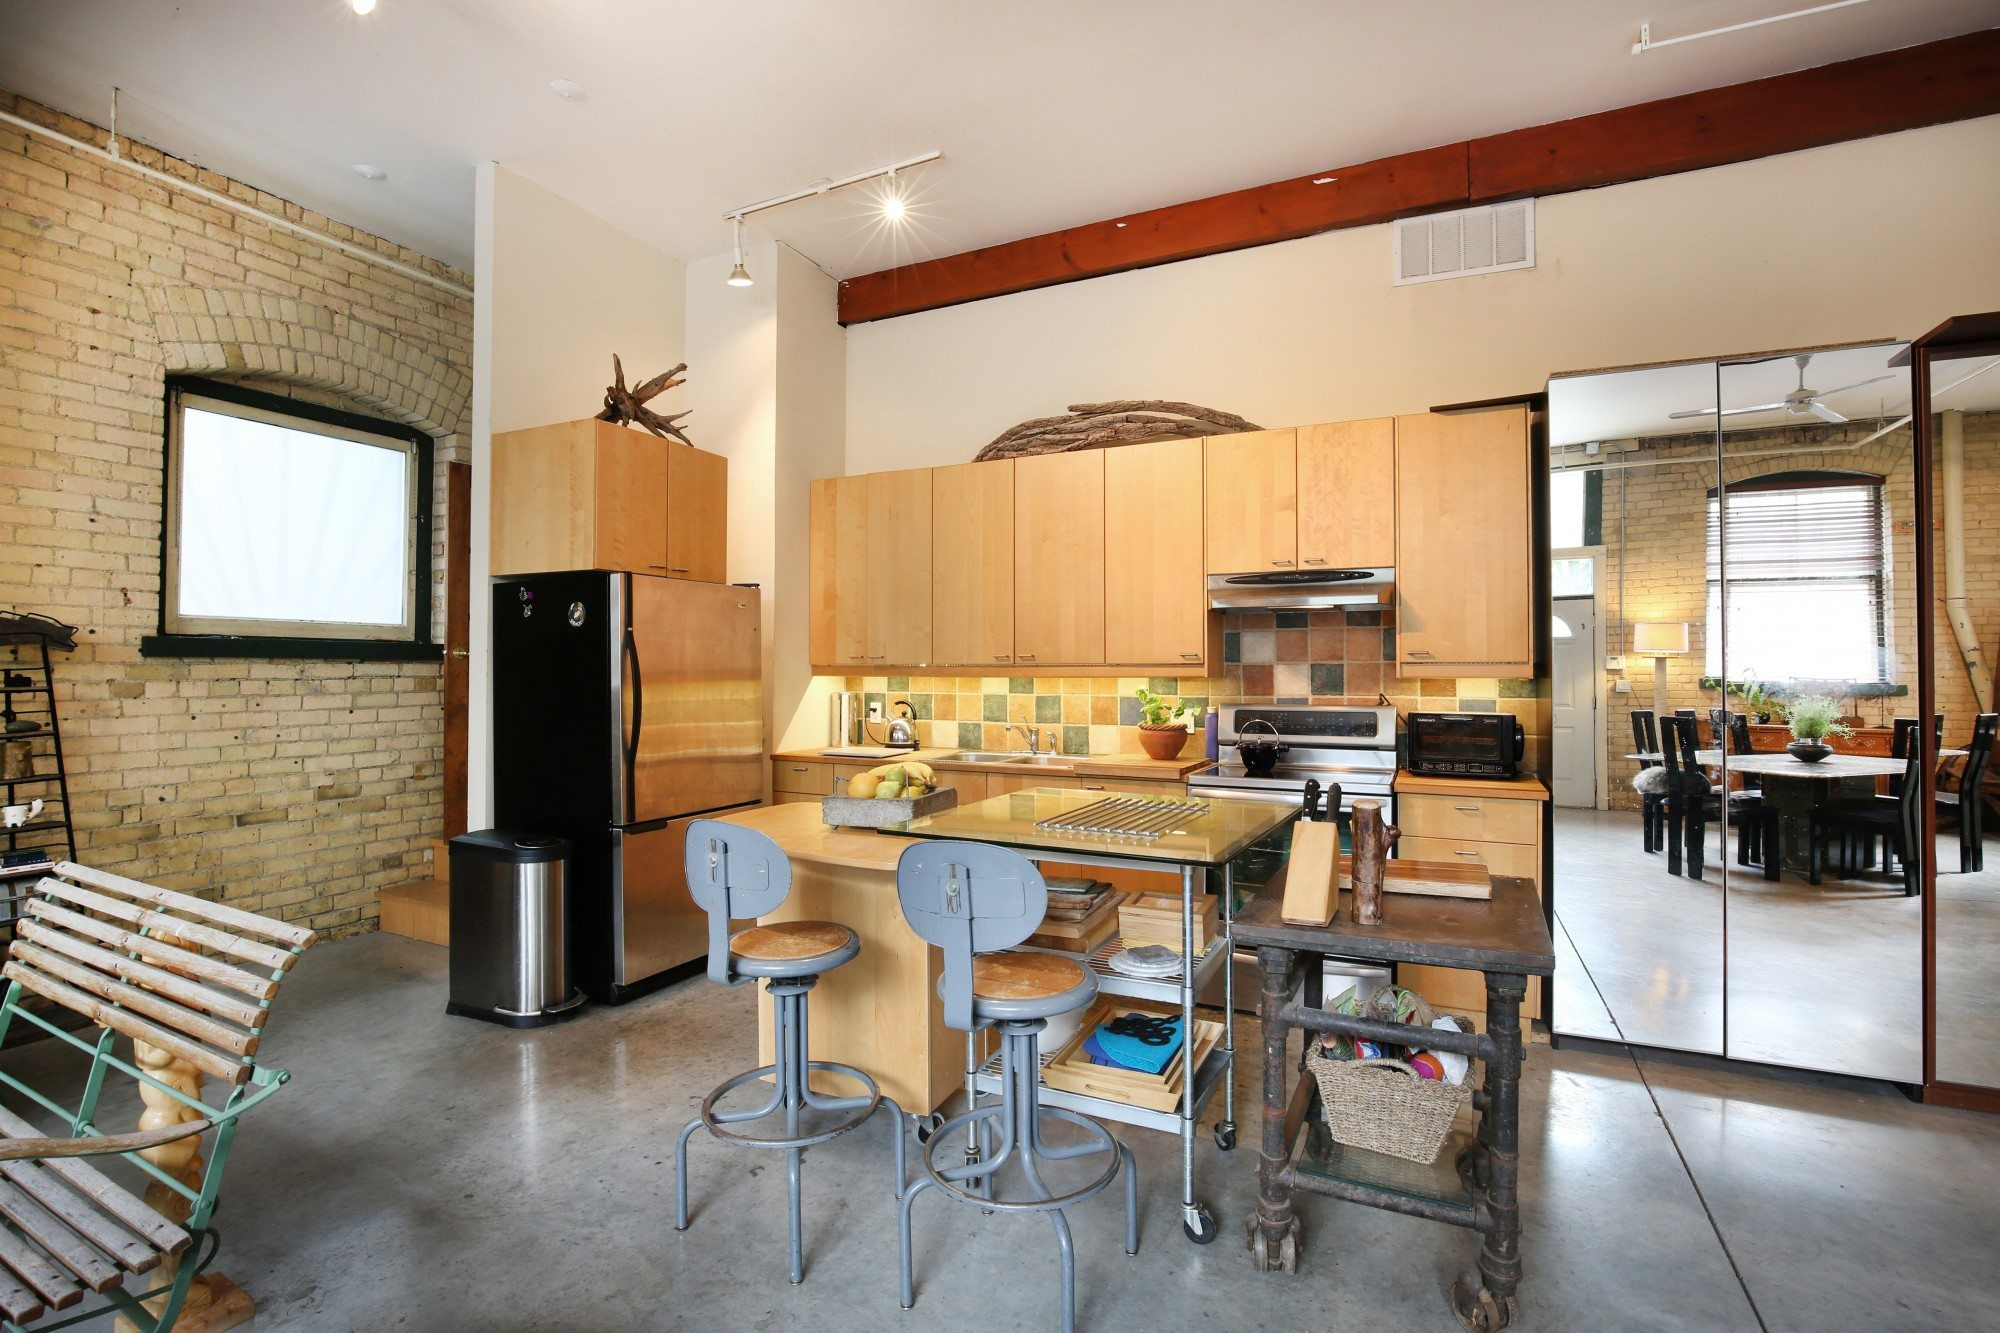 toronto-house-for-sale-154-shuter-street-4